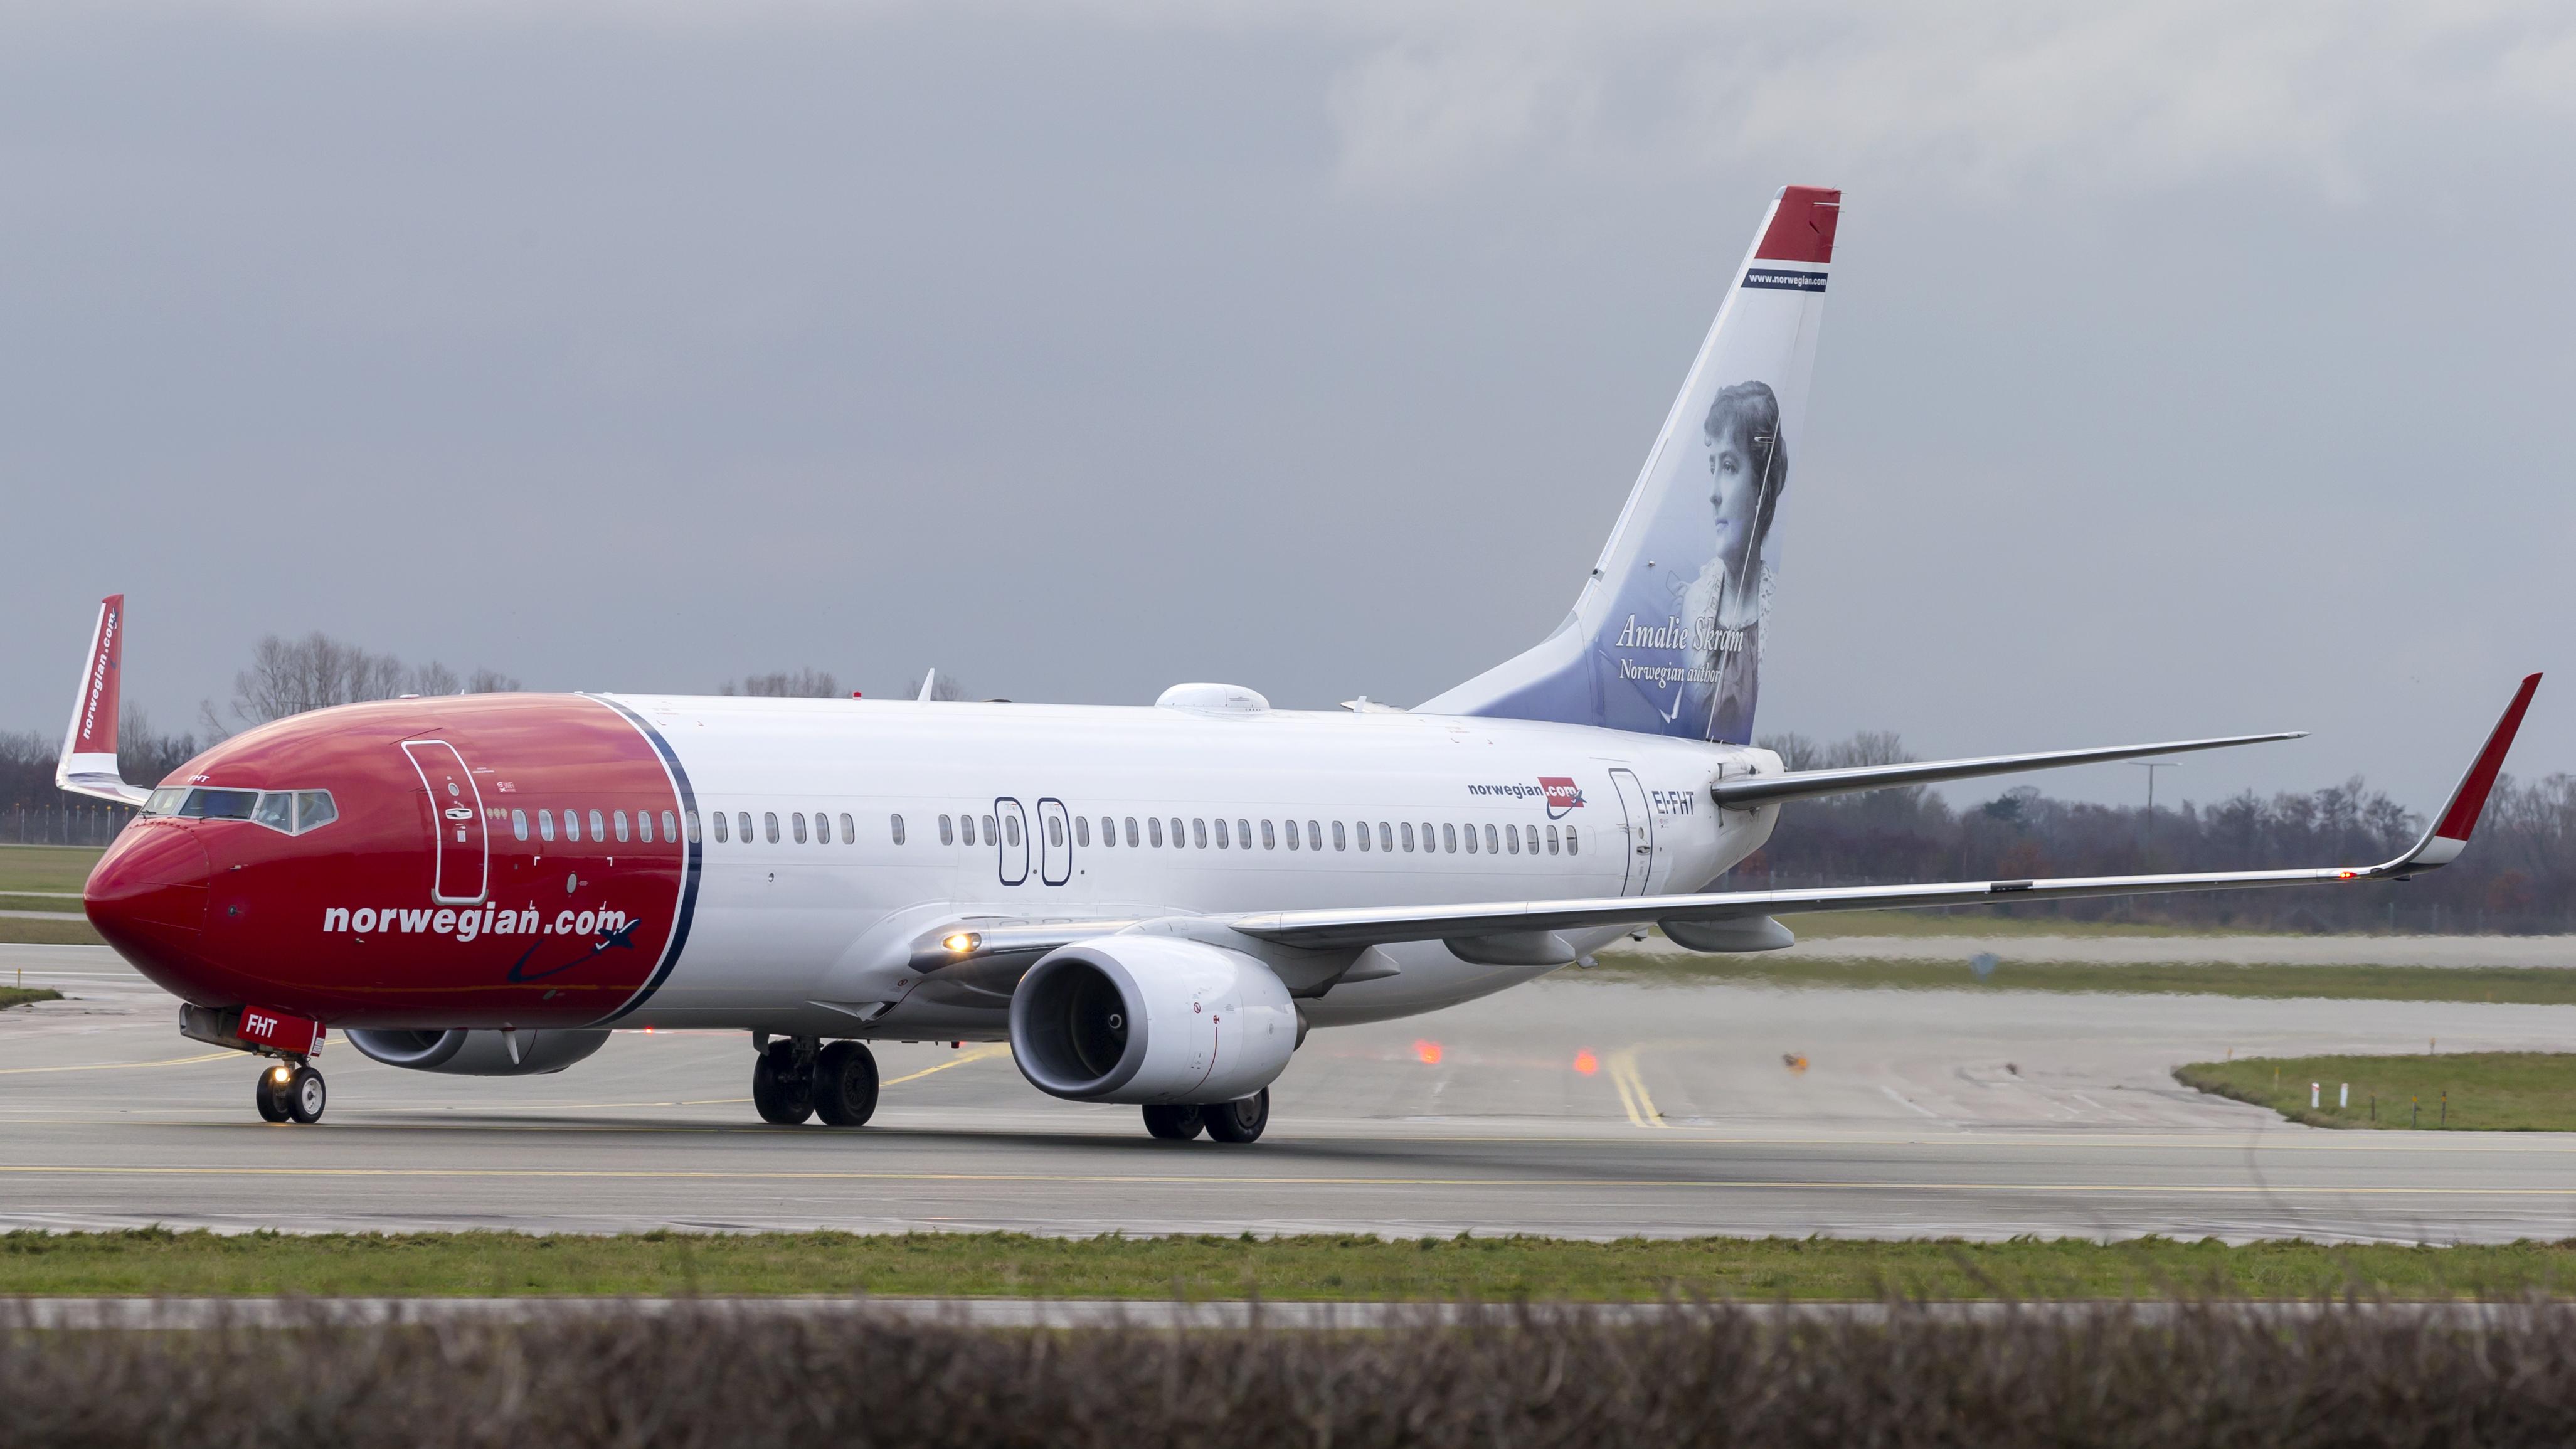 En Boeing 737-800 fra Norwegian. Foto: © Thorbjørn Brunander Sund, Danish Aviation Photo